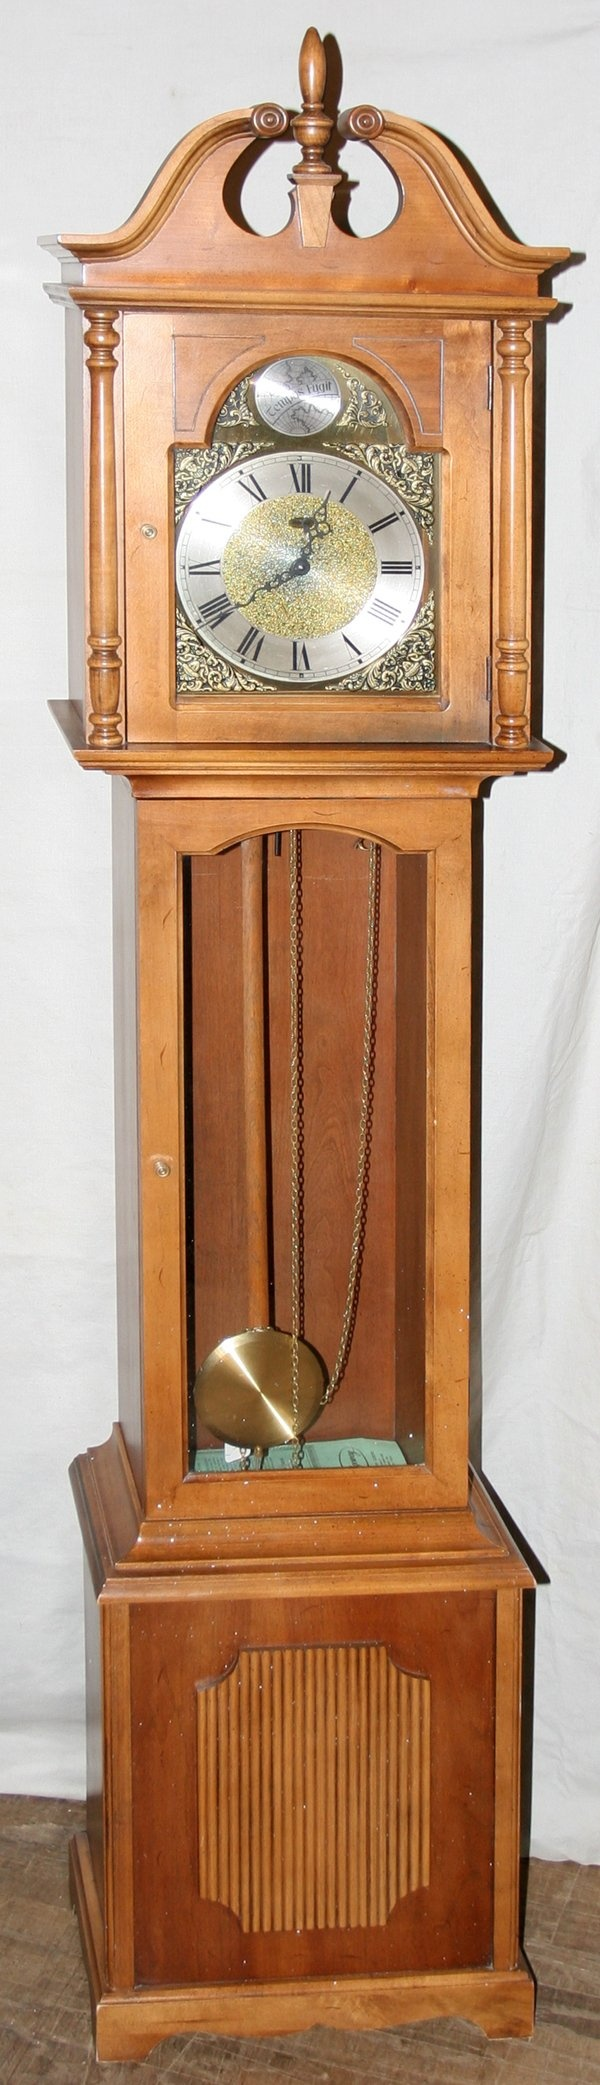 cambridge grandfather clock